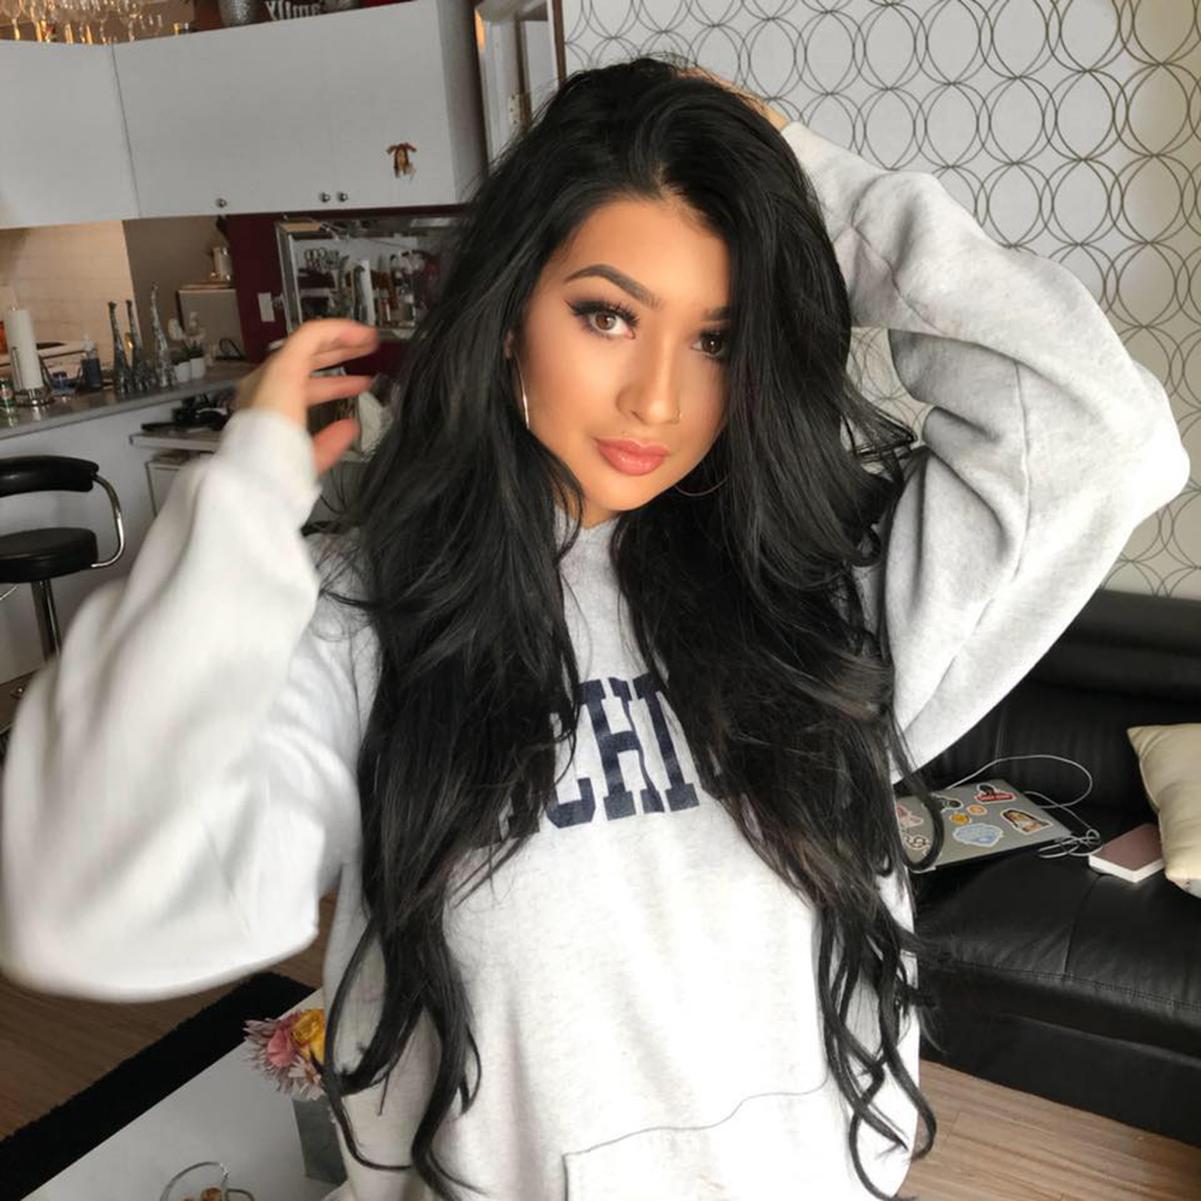 Carly Steel dating online dating Ventura CA